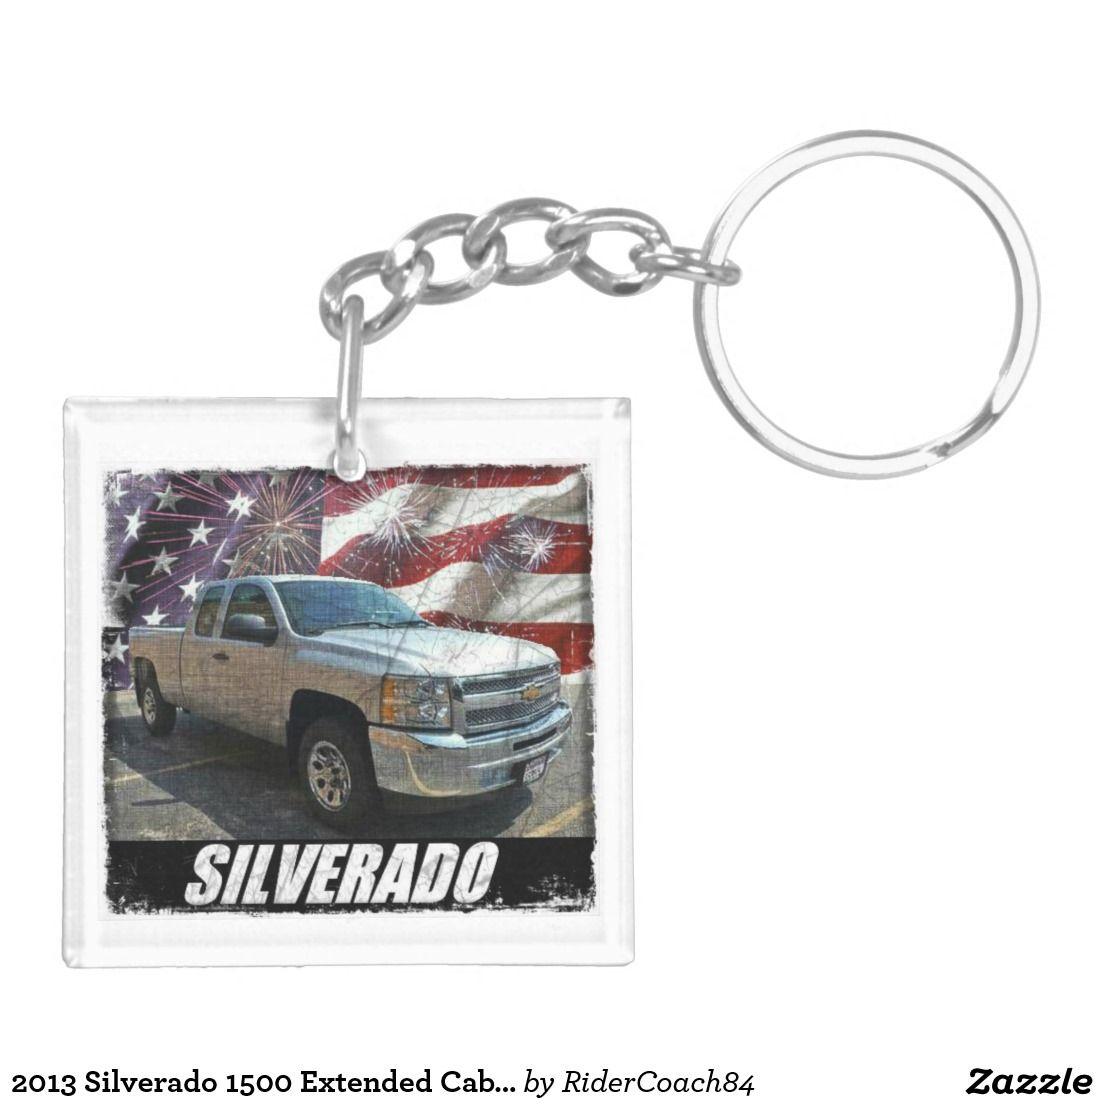 2013 Silverado 1500 Extended Cab Ls Keychain Chevrolet Pinterest 1971 Amc Gremlin Wiring Diagram